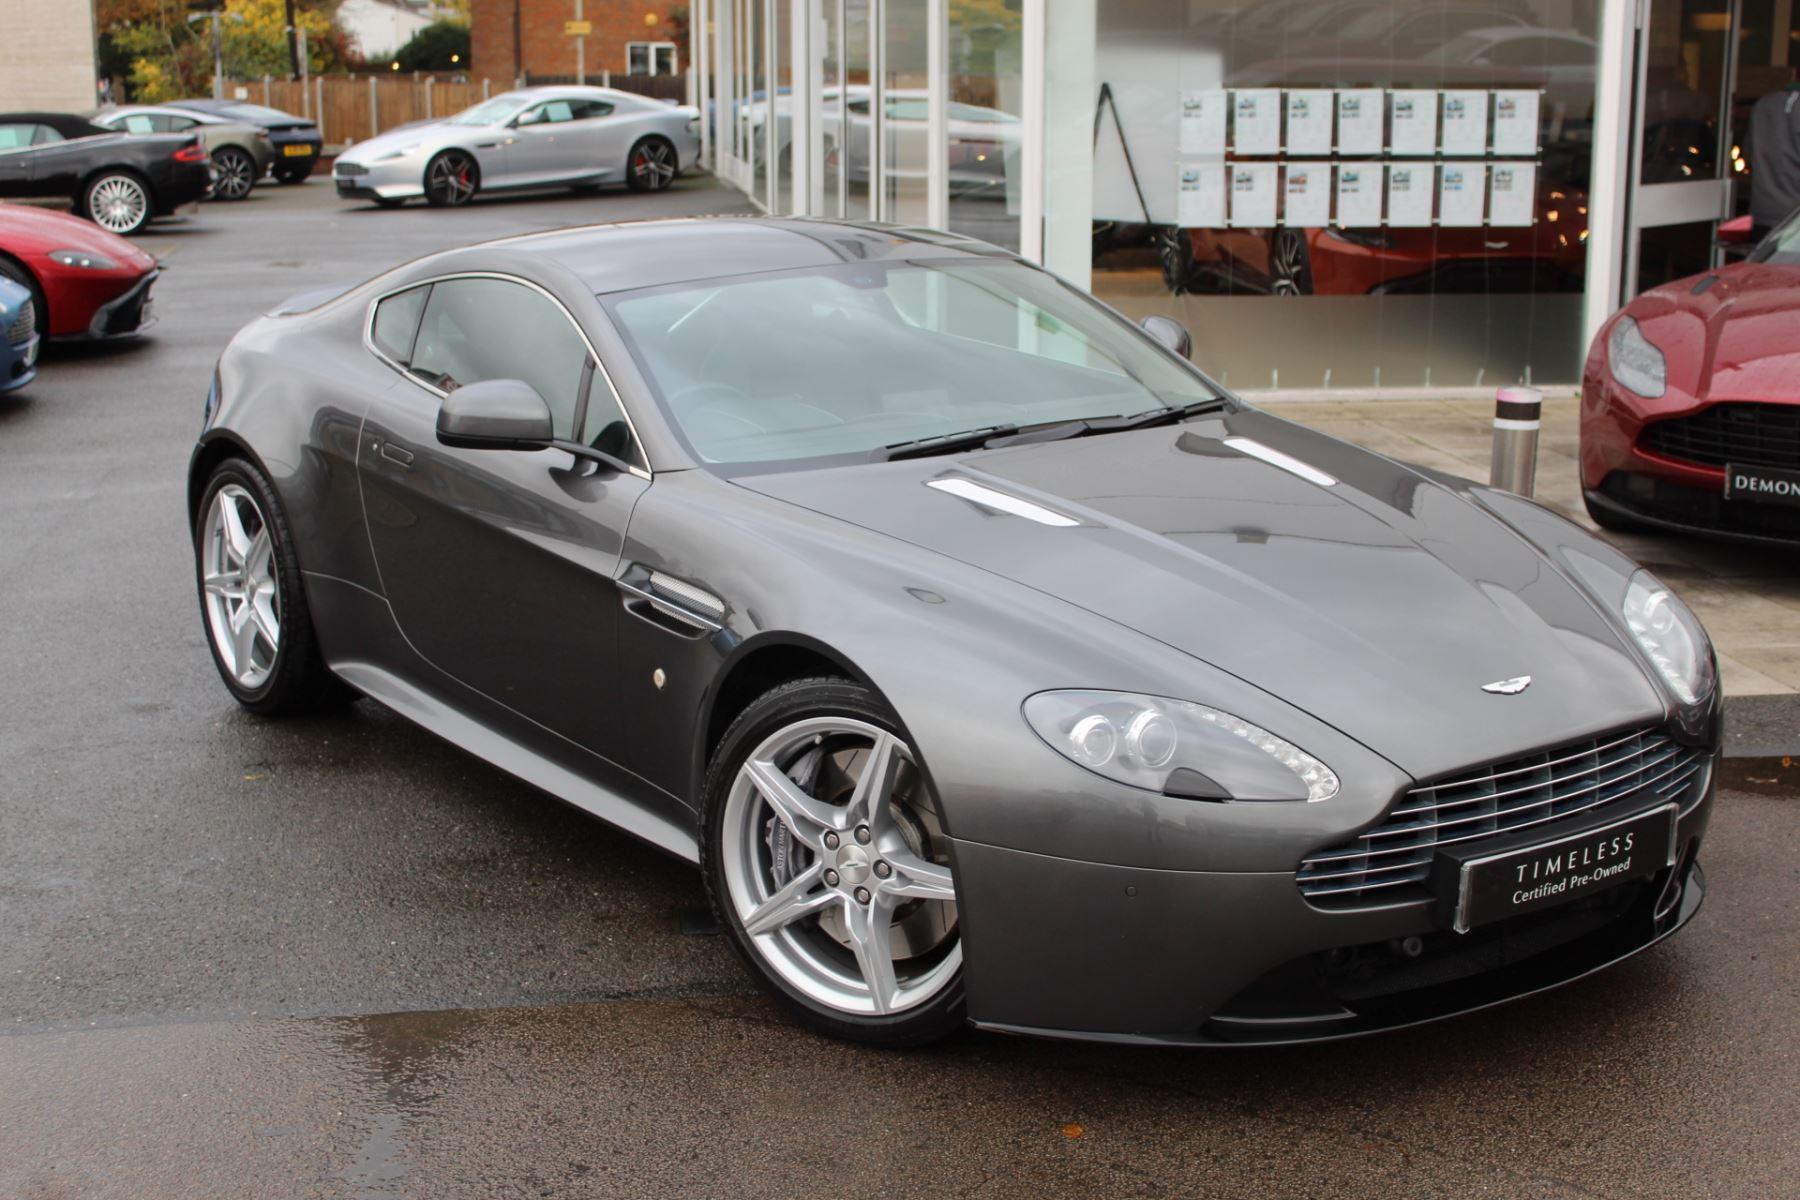 Aston Martin V8 Vantage S Coupe S 2dr Sportshift image 2